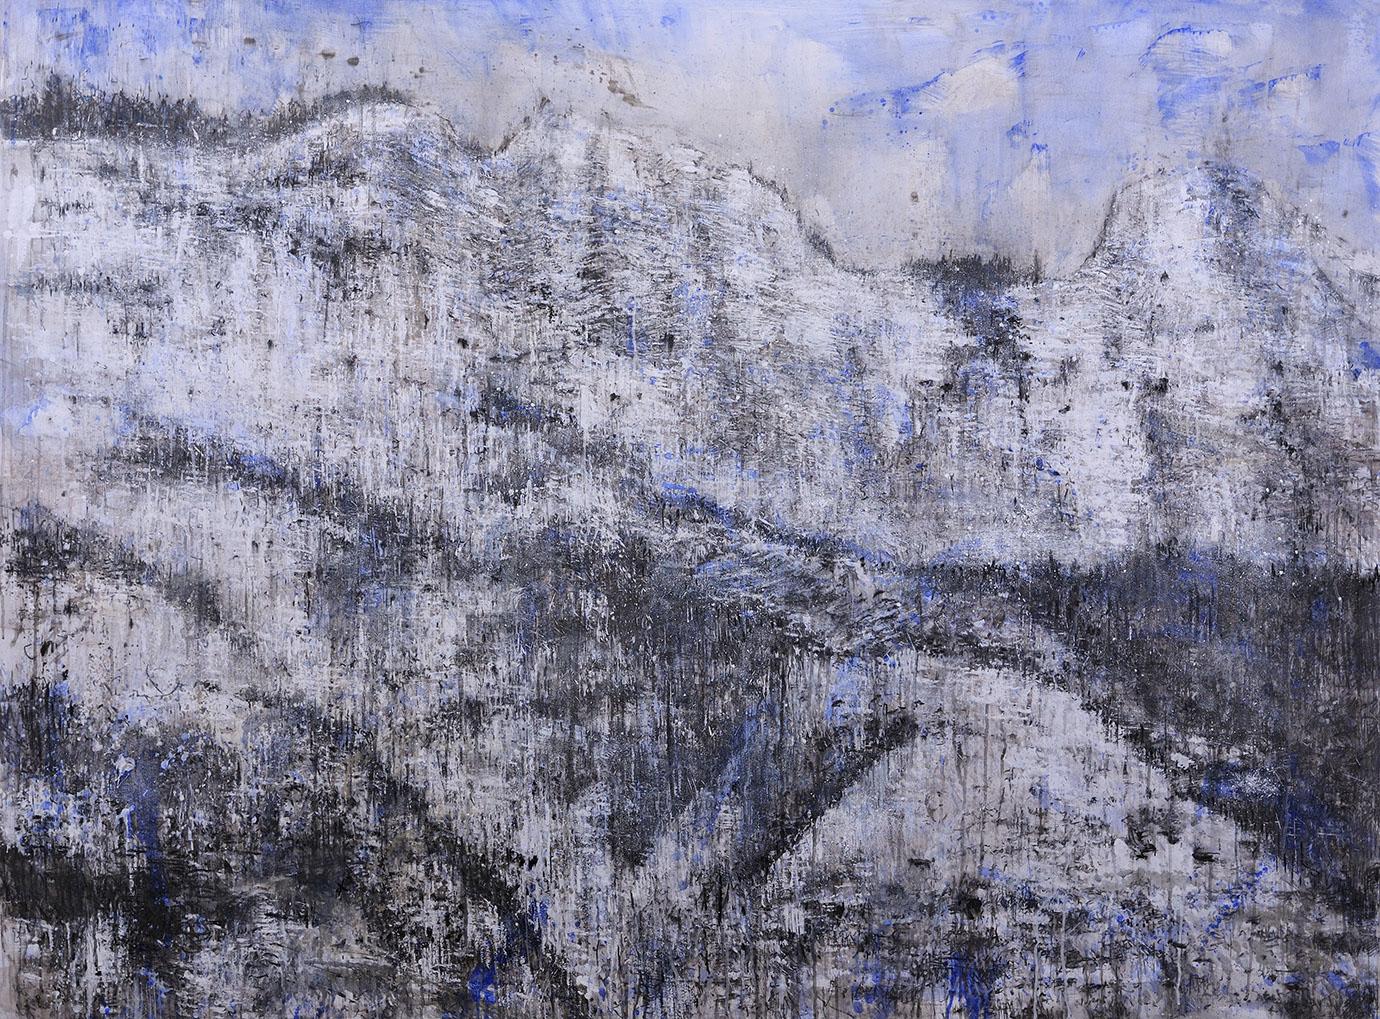 #3 Winterreise - 2020 grafite, fusaggine, pigmento, acrilico,olio su carta 150x200